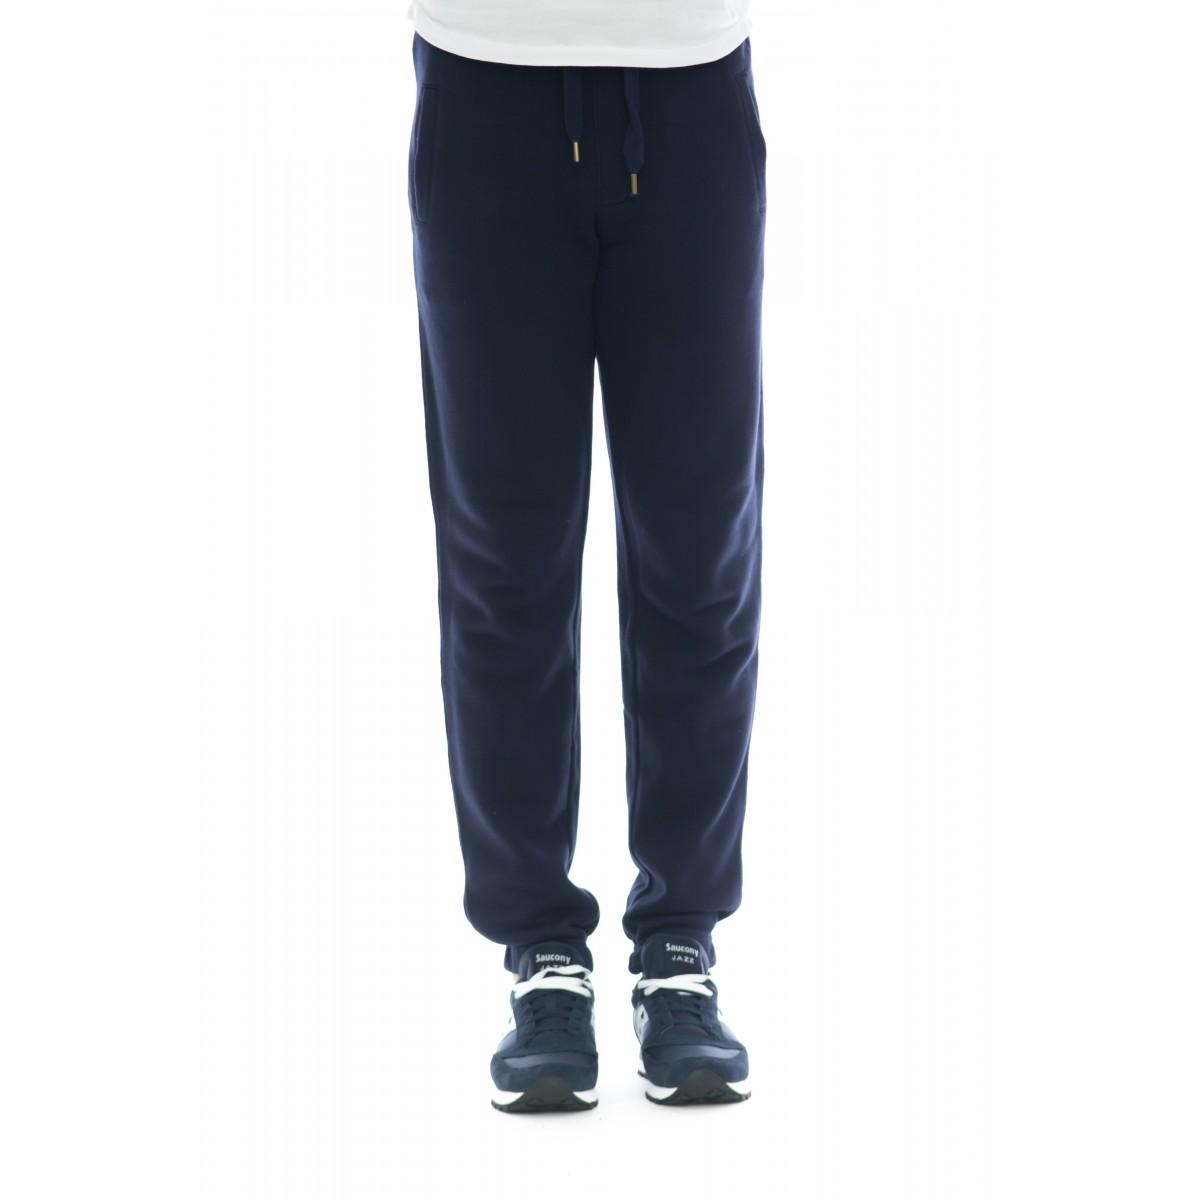 Pantalone uomo - F29126 pantalone jogging